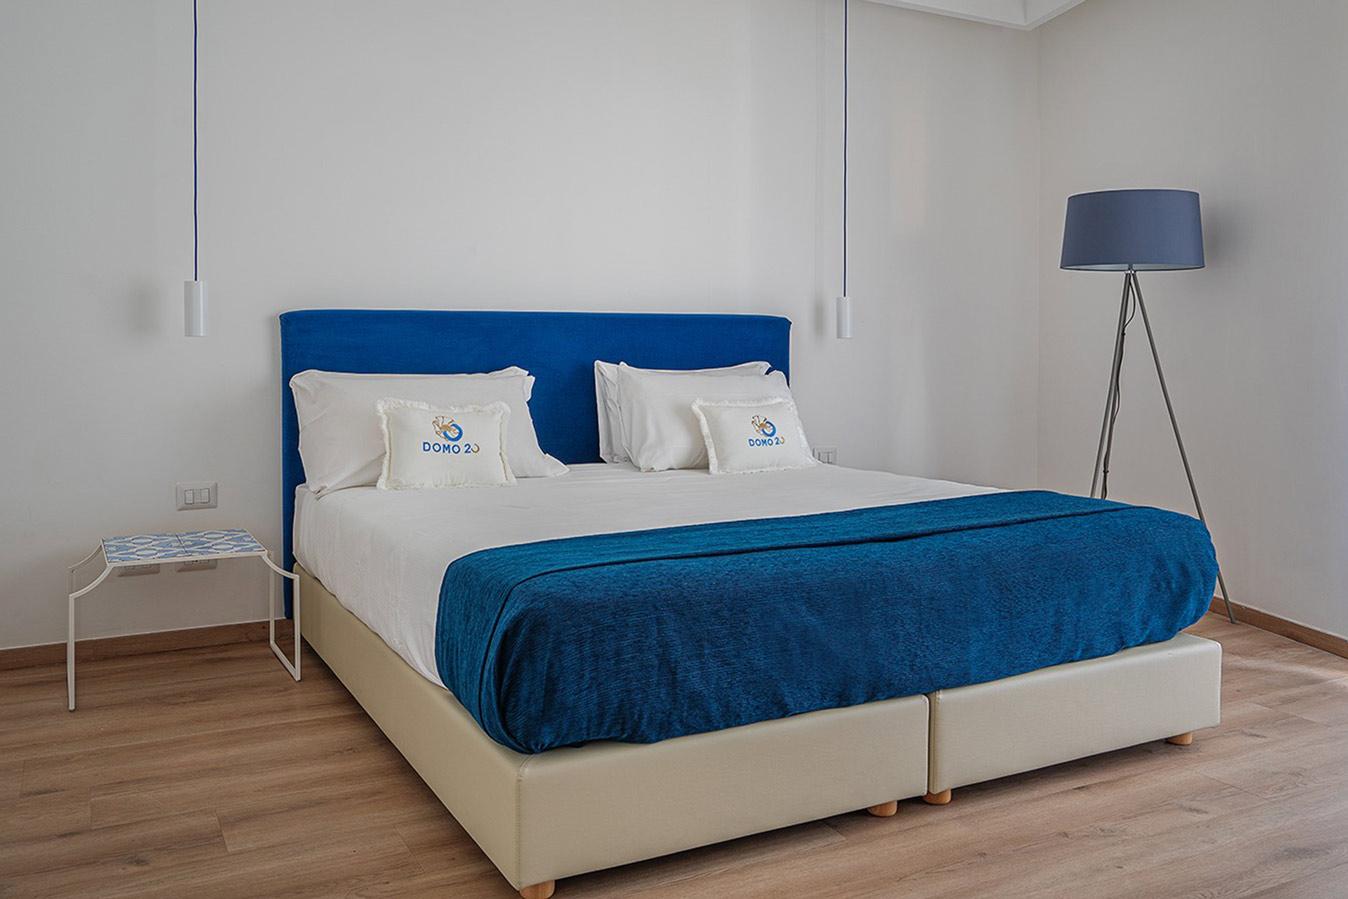 Domo20-Double-Room-Deluxe-Vista-Mare-con-finestra-Luxury-Hostel-Sorrento-Coast-Amalfi-Vico-Equense-Pompeii-Naples-Italy-Restaurant-Mima-Pool-102